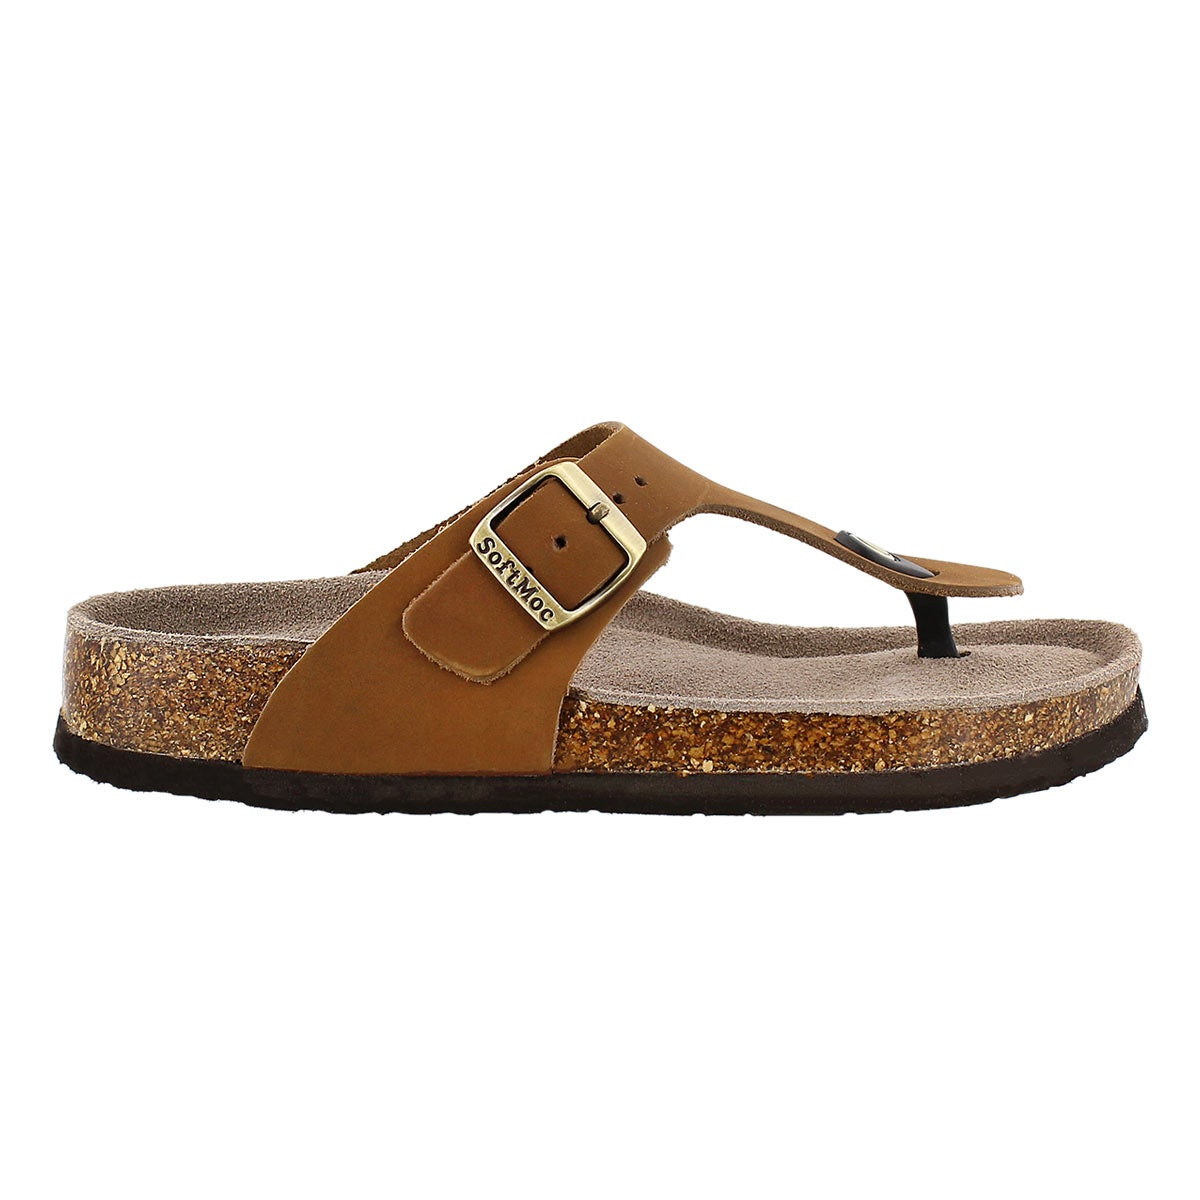 Lds Angy 4 tan memory foam thong sandal